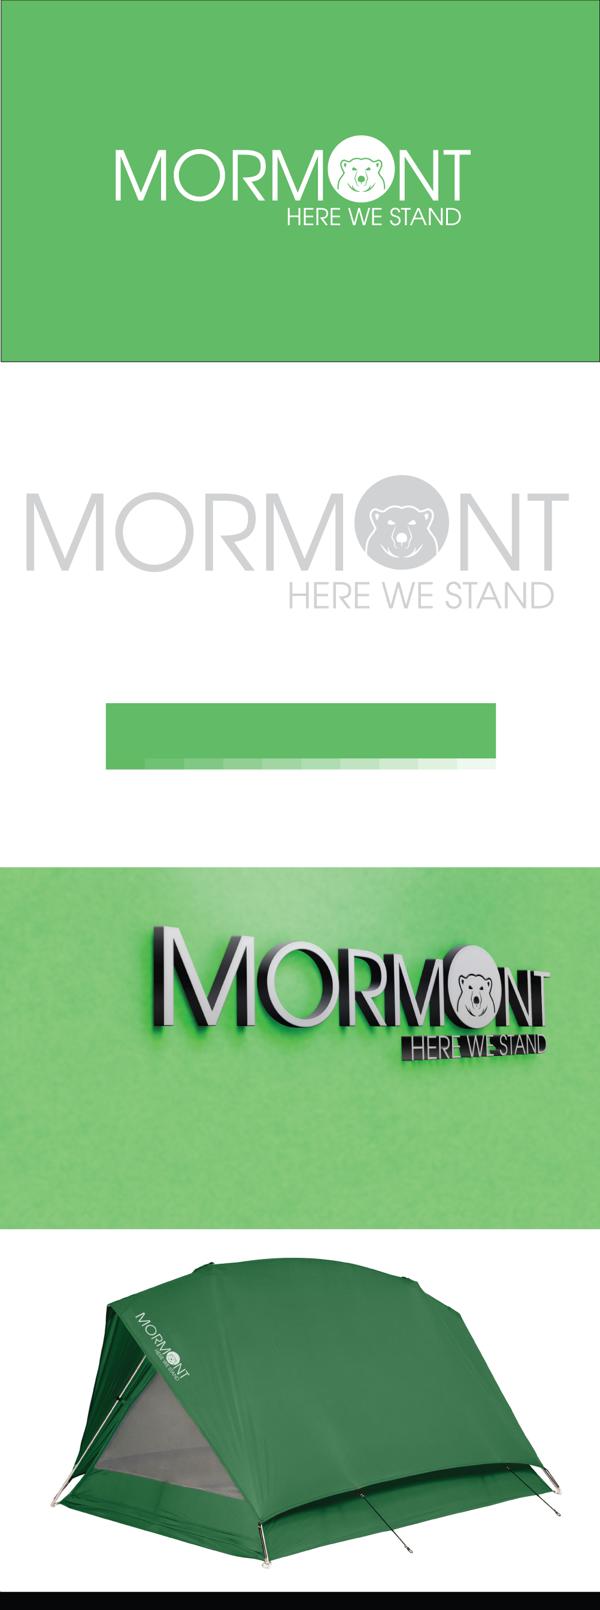 mormont-got-lenewssbh